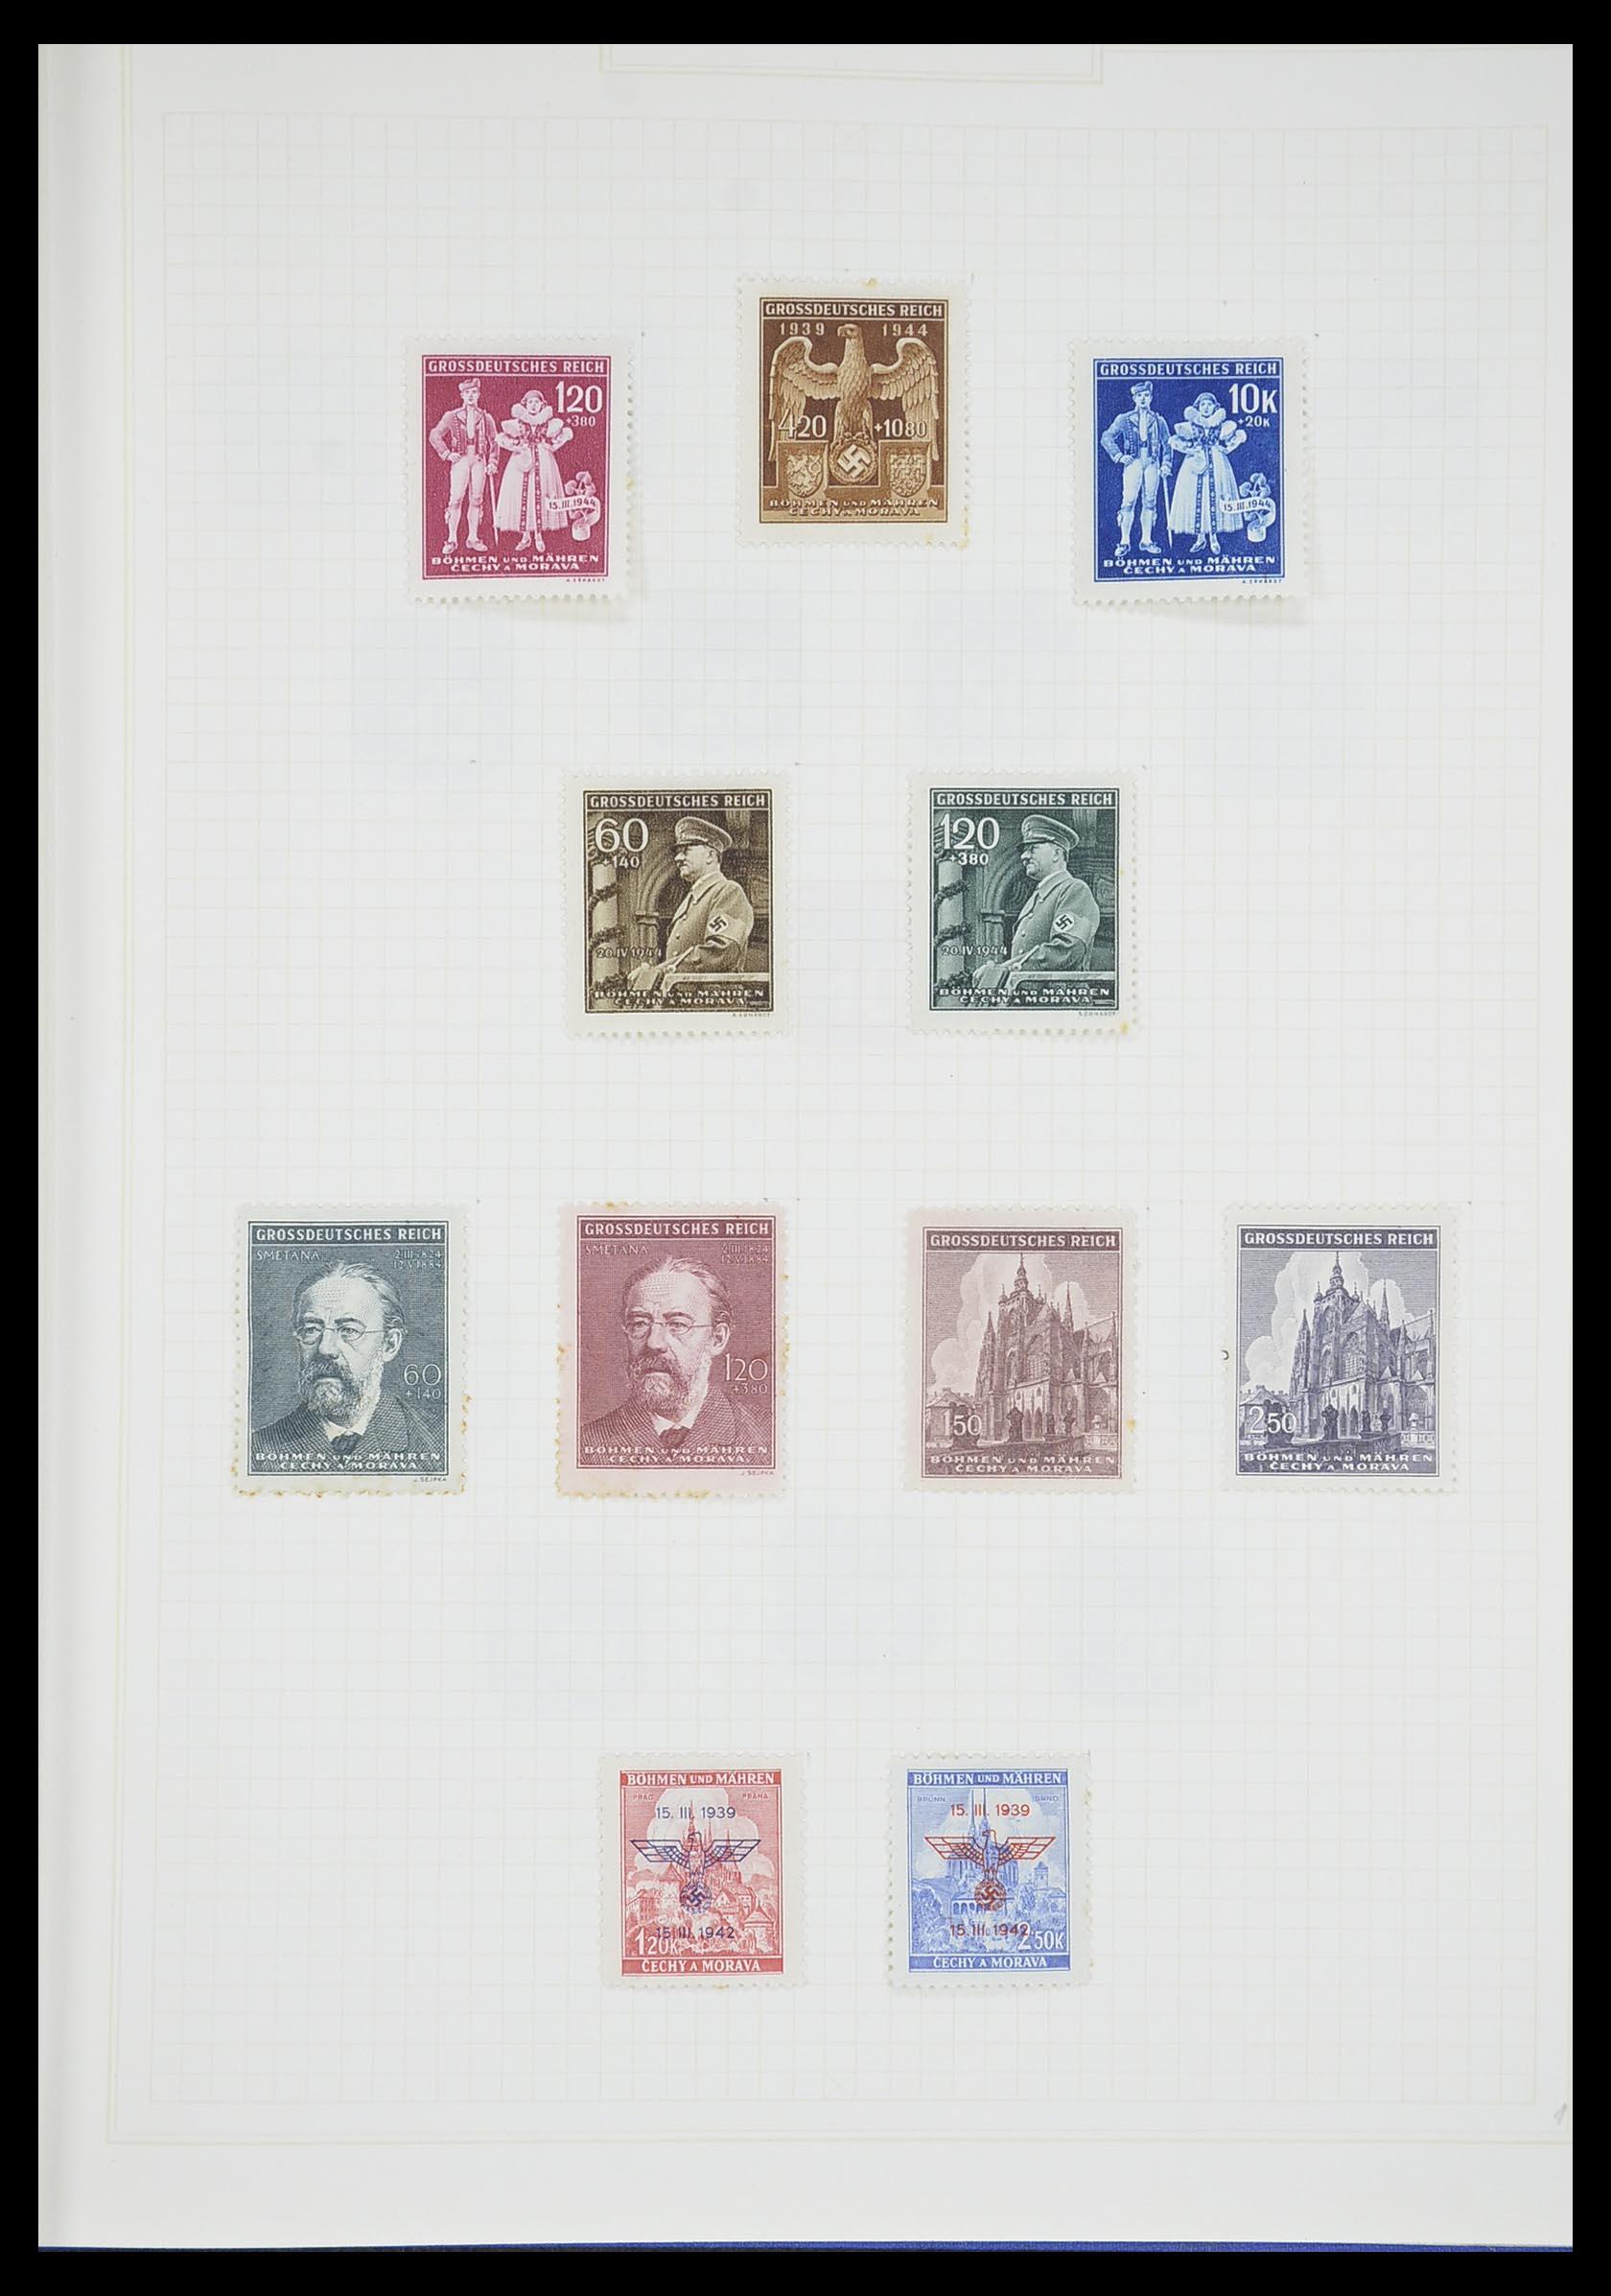 33713 020 - Postzegelverzameling 33713 Duitse bezettingen WO I en WO II 1914-1945